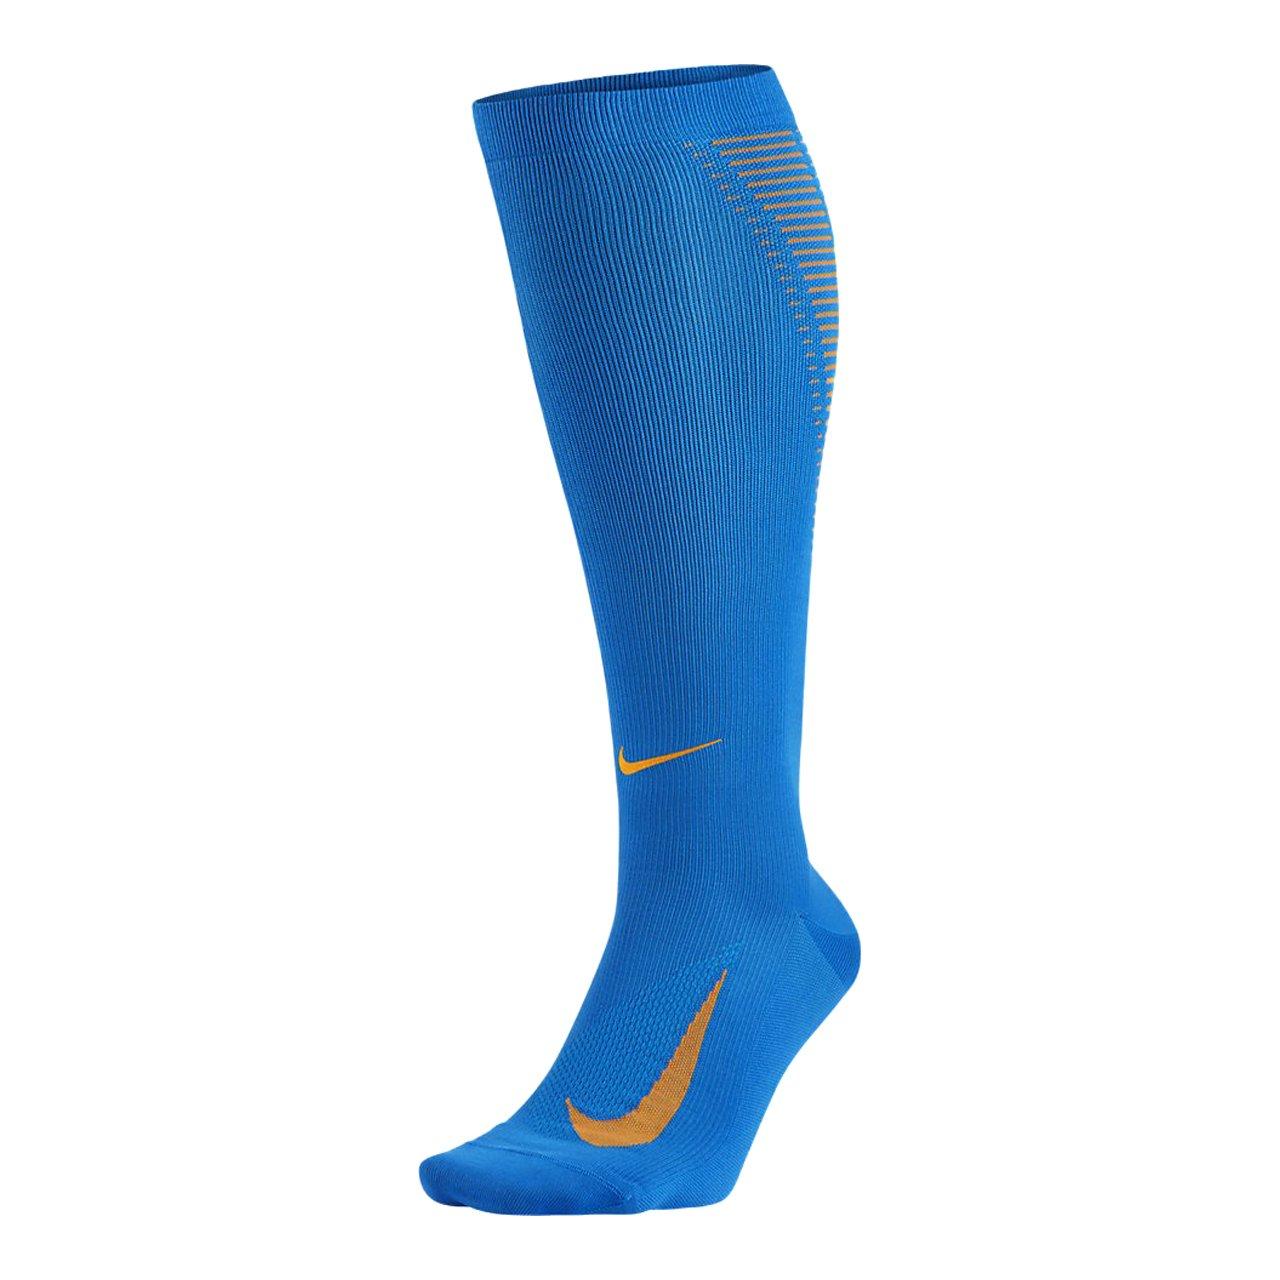 Blau (Photo Blau   Vivid Orange   Reflect Silber) Nike U Nk ELT Comp OTC Calcetines, Hombre